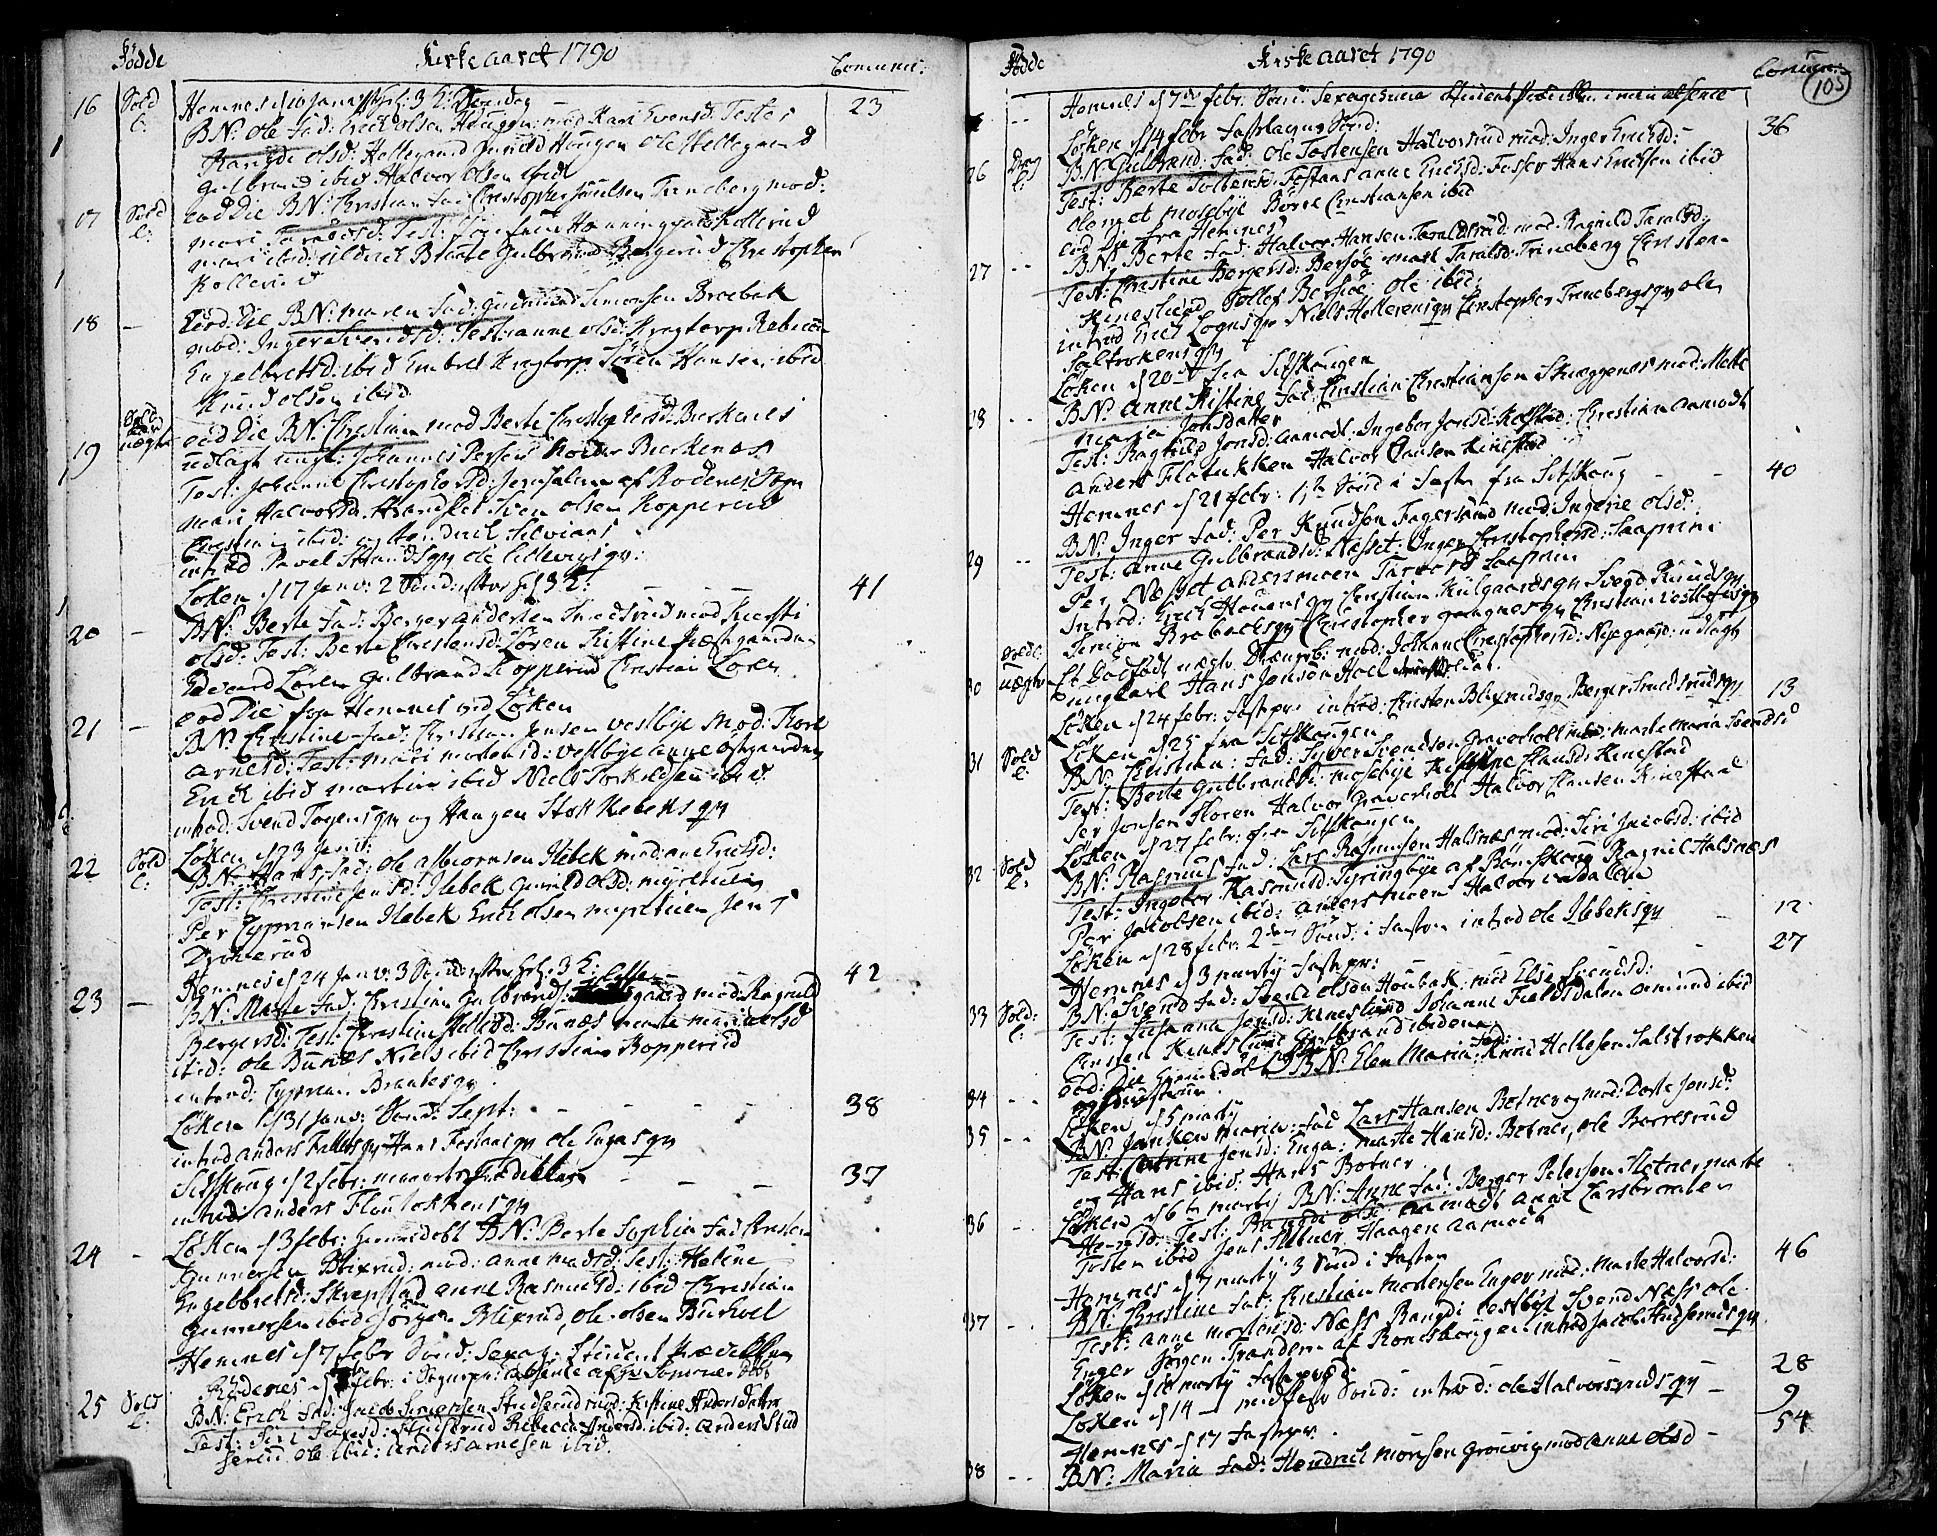 SAO, Høland prestekontor Kirkebøker, F/Fa/L0005: Ministerialbok nr. I 5, 1780-1793, s. 105